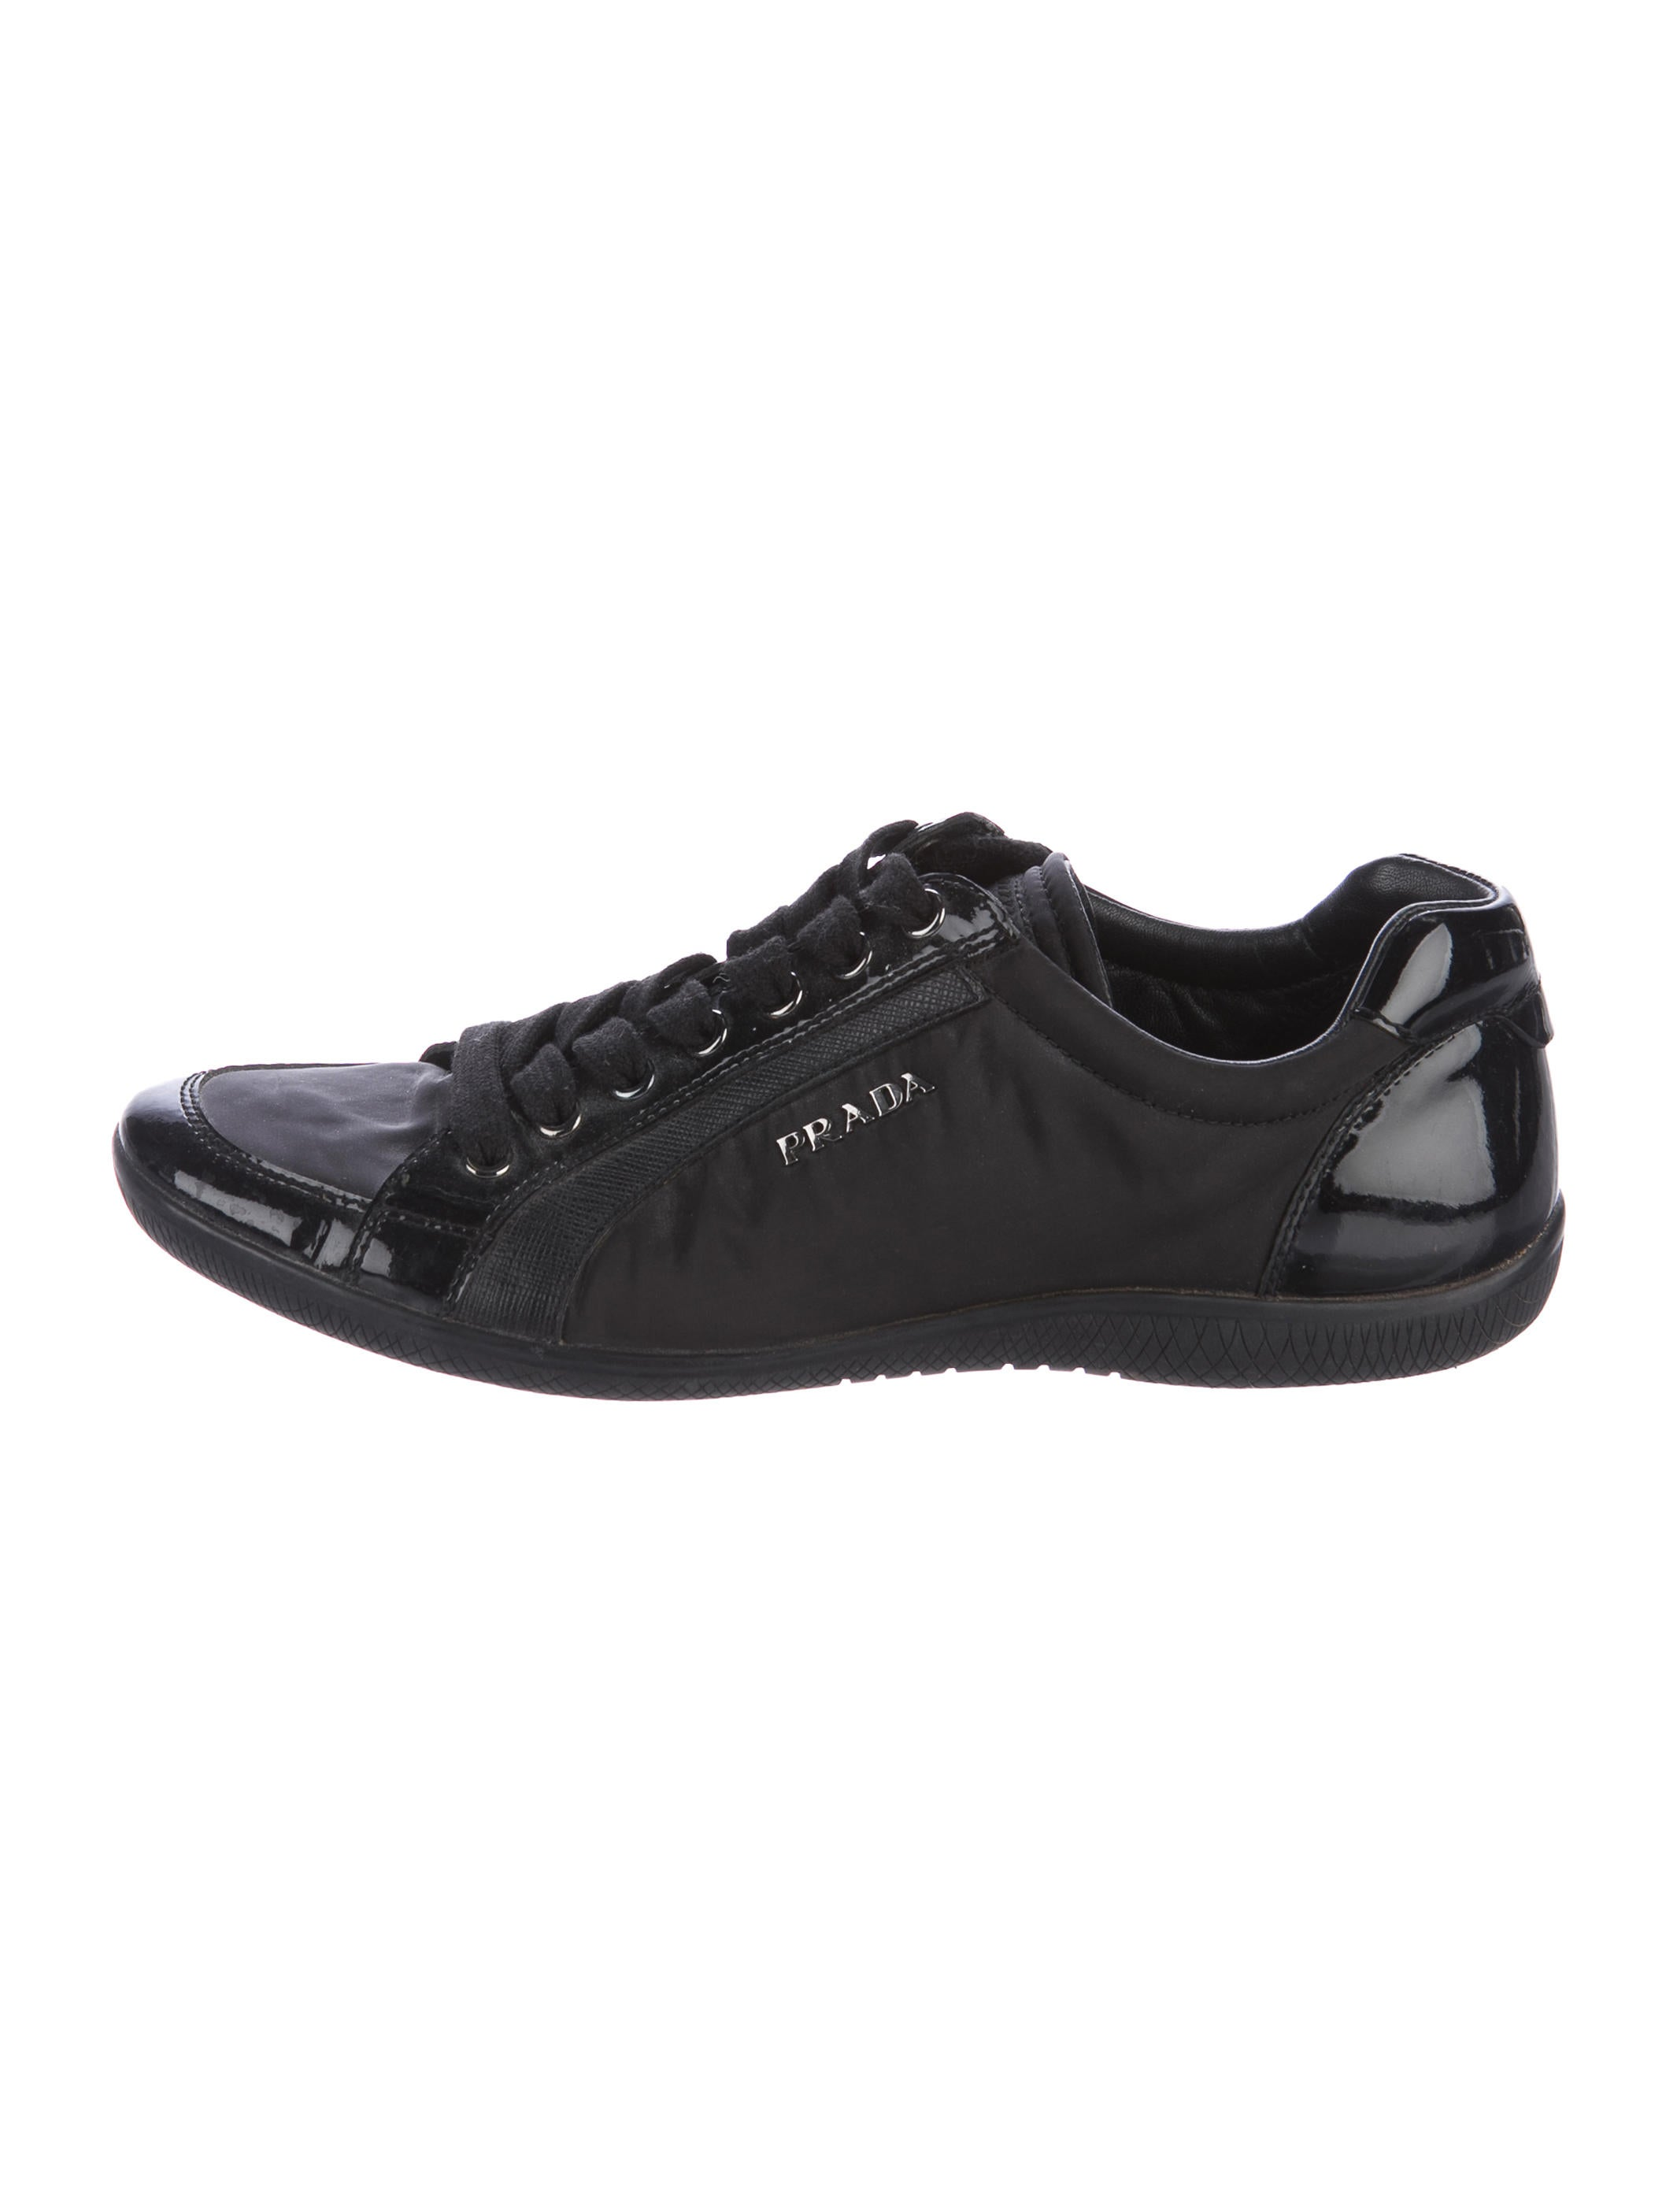 65966d05f361 Prada Sport Nylon Low-Top Sneakers - Shoes - WPR46083 | The RealReal